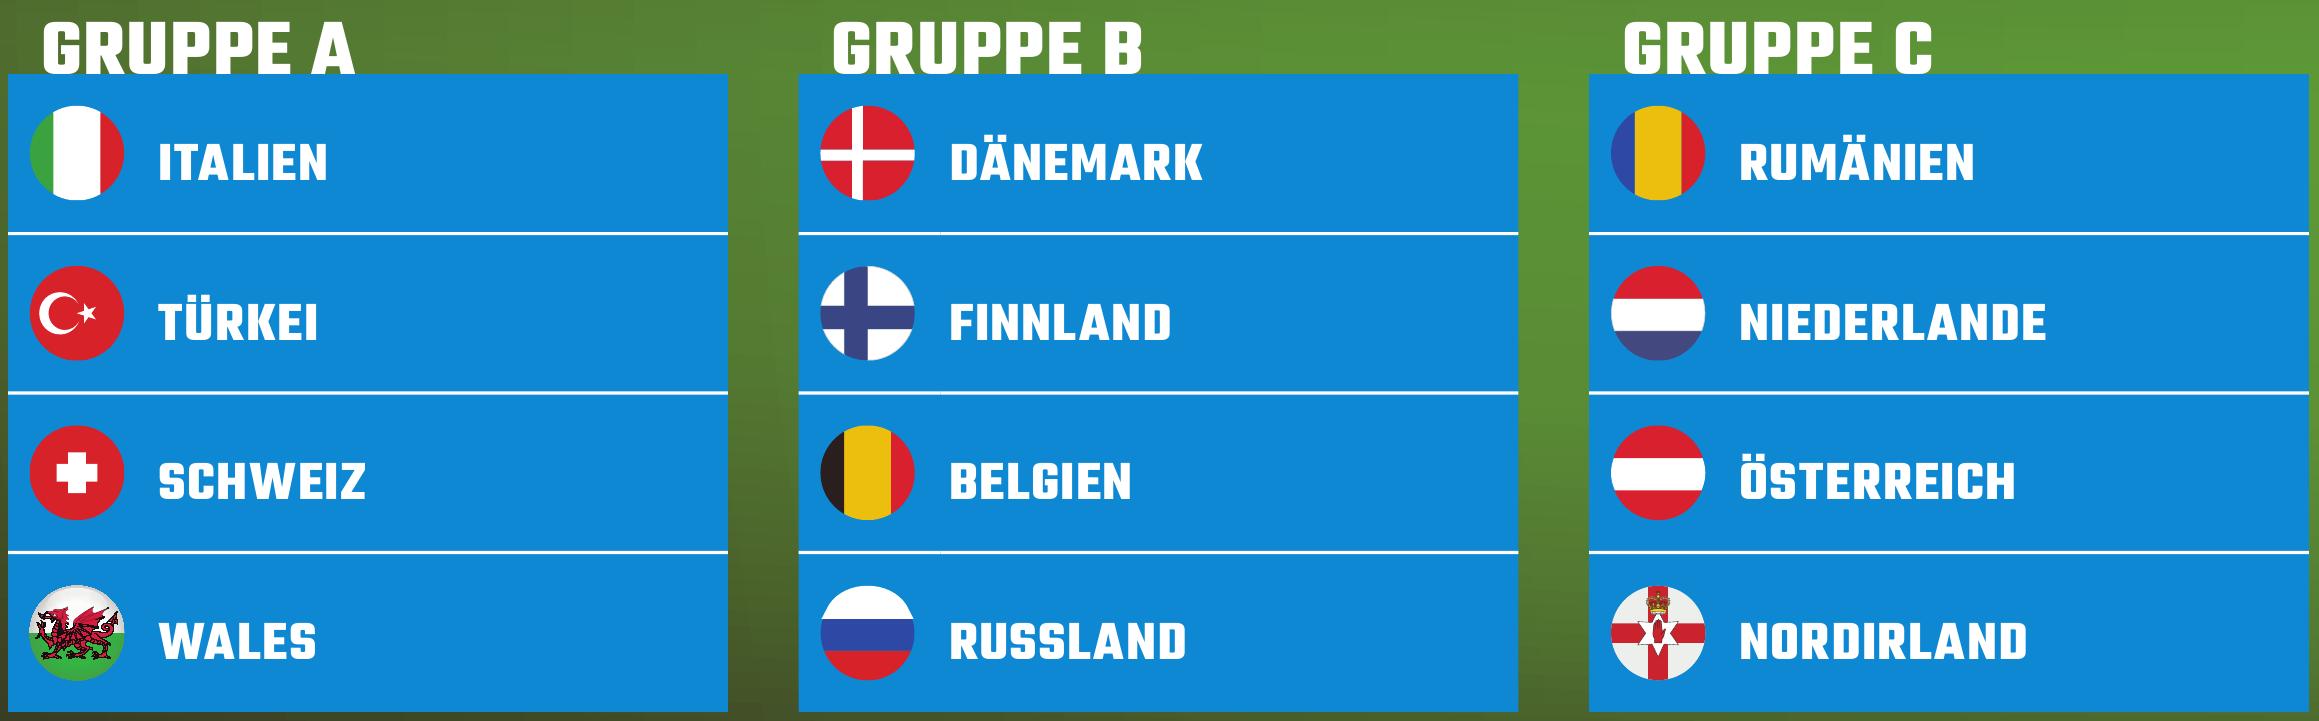 Anpfiff für den E-Soccer-Cup Image 6